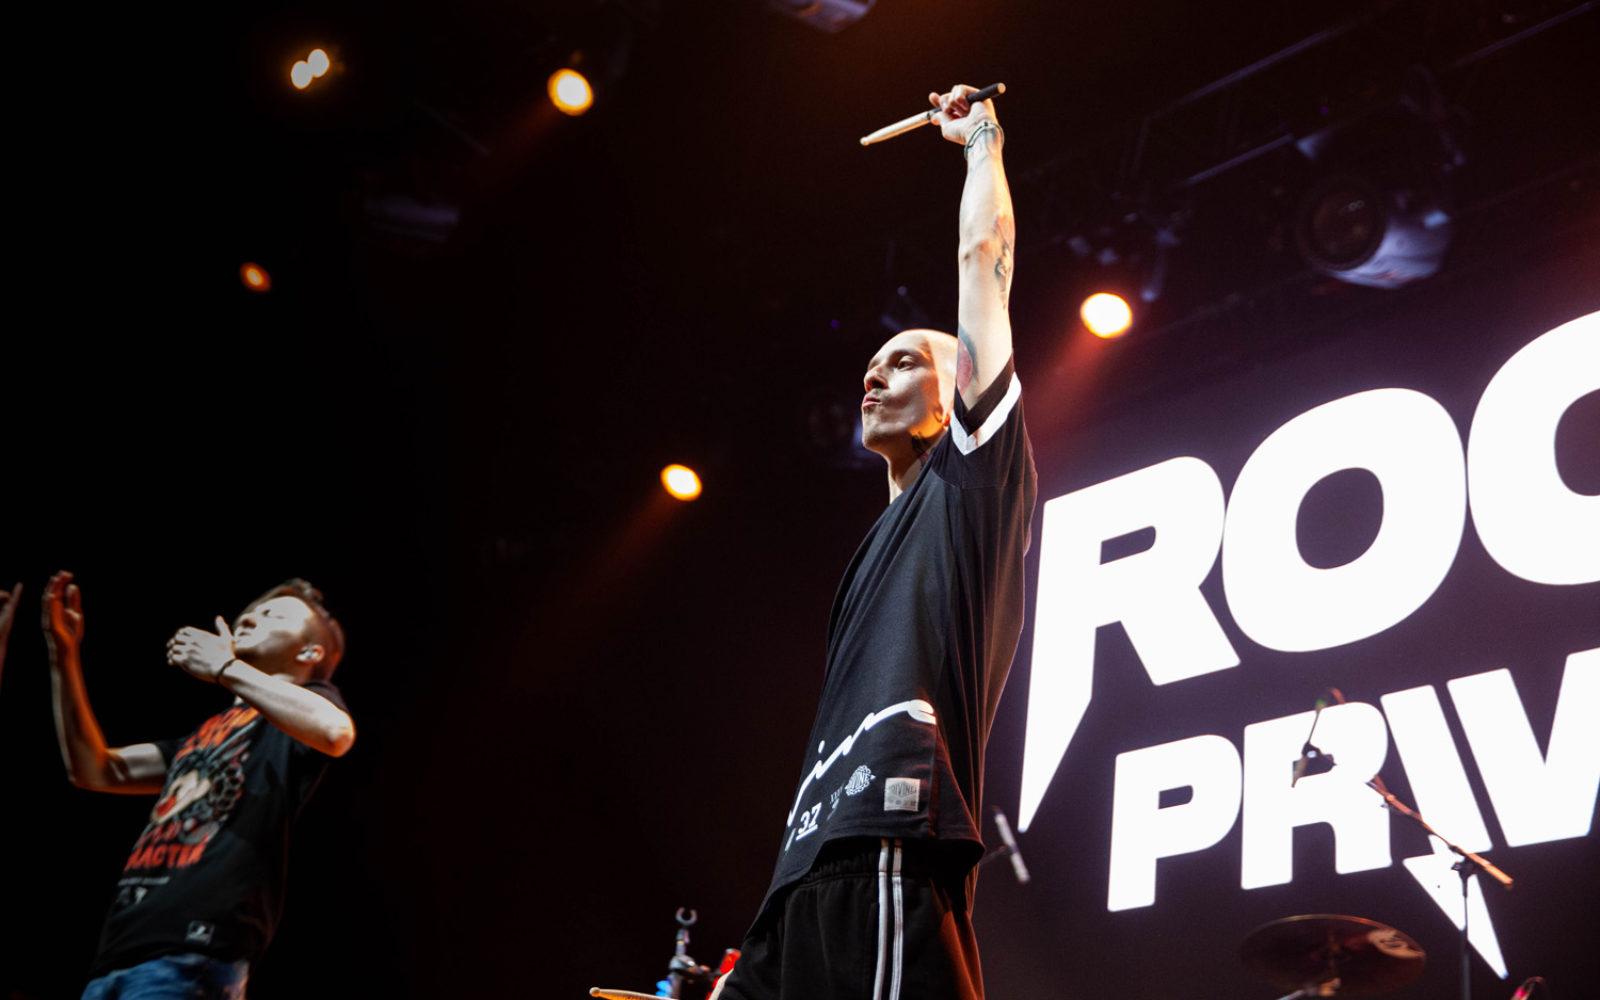 rock_privet (97 of 98)